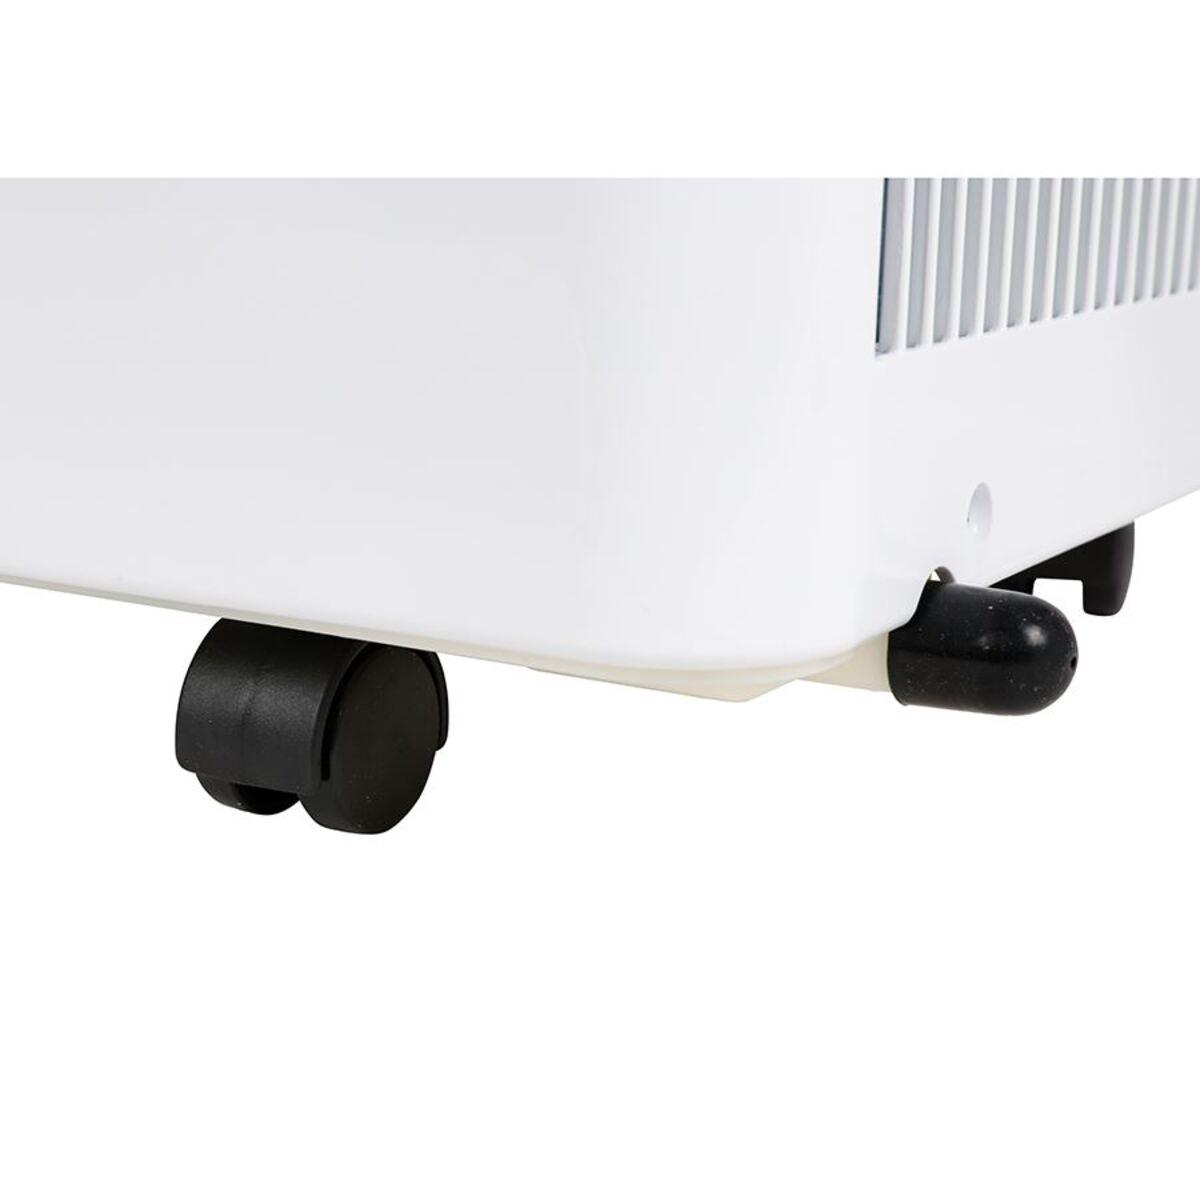 Bild 5 von Alpina Klimagerät A007G-09C 9000 BTU